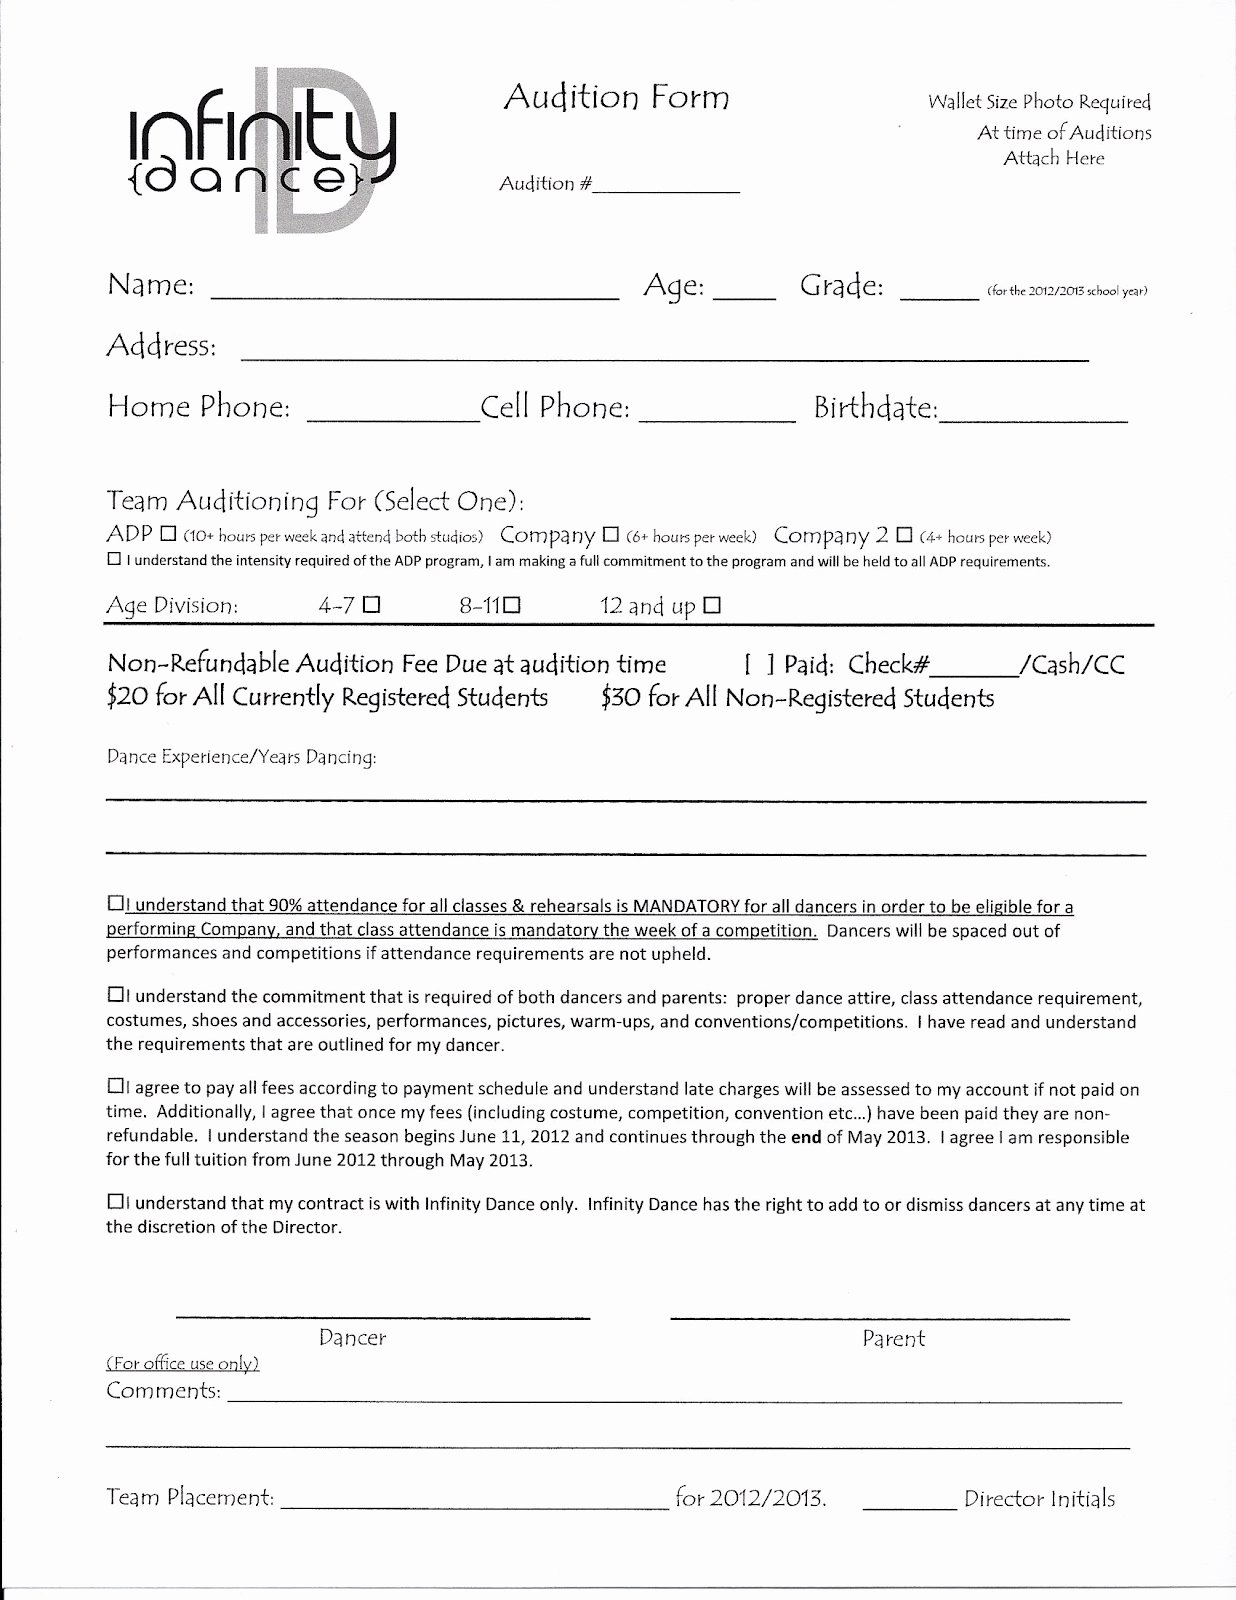 Dance Registration form Template New Audition form